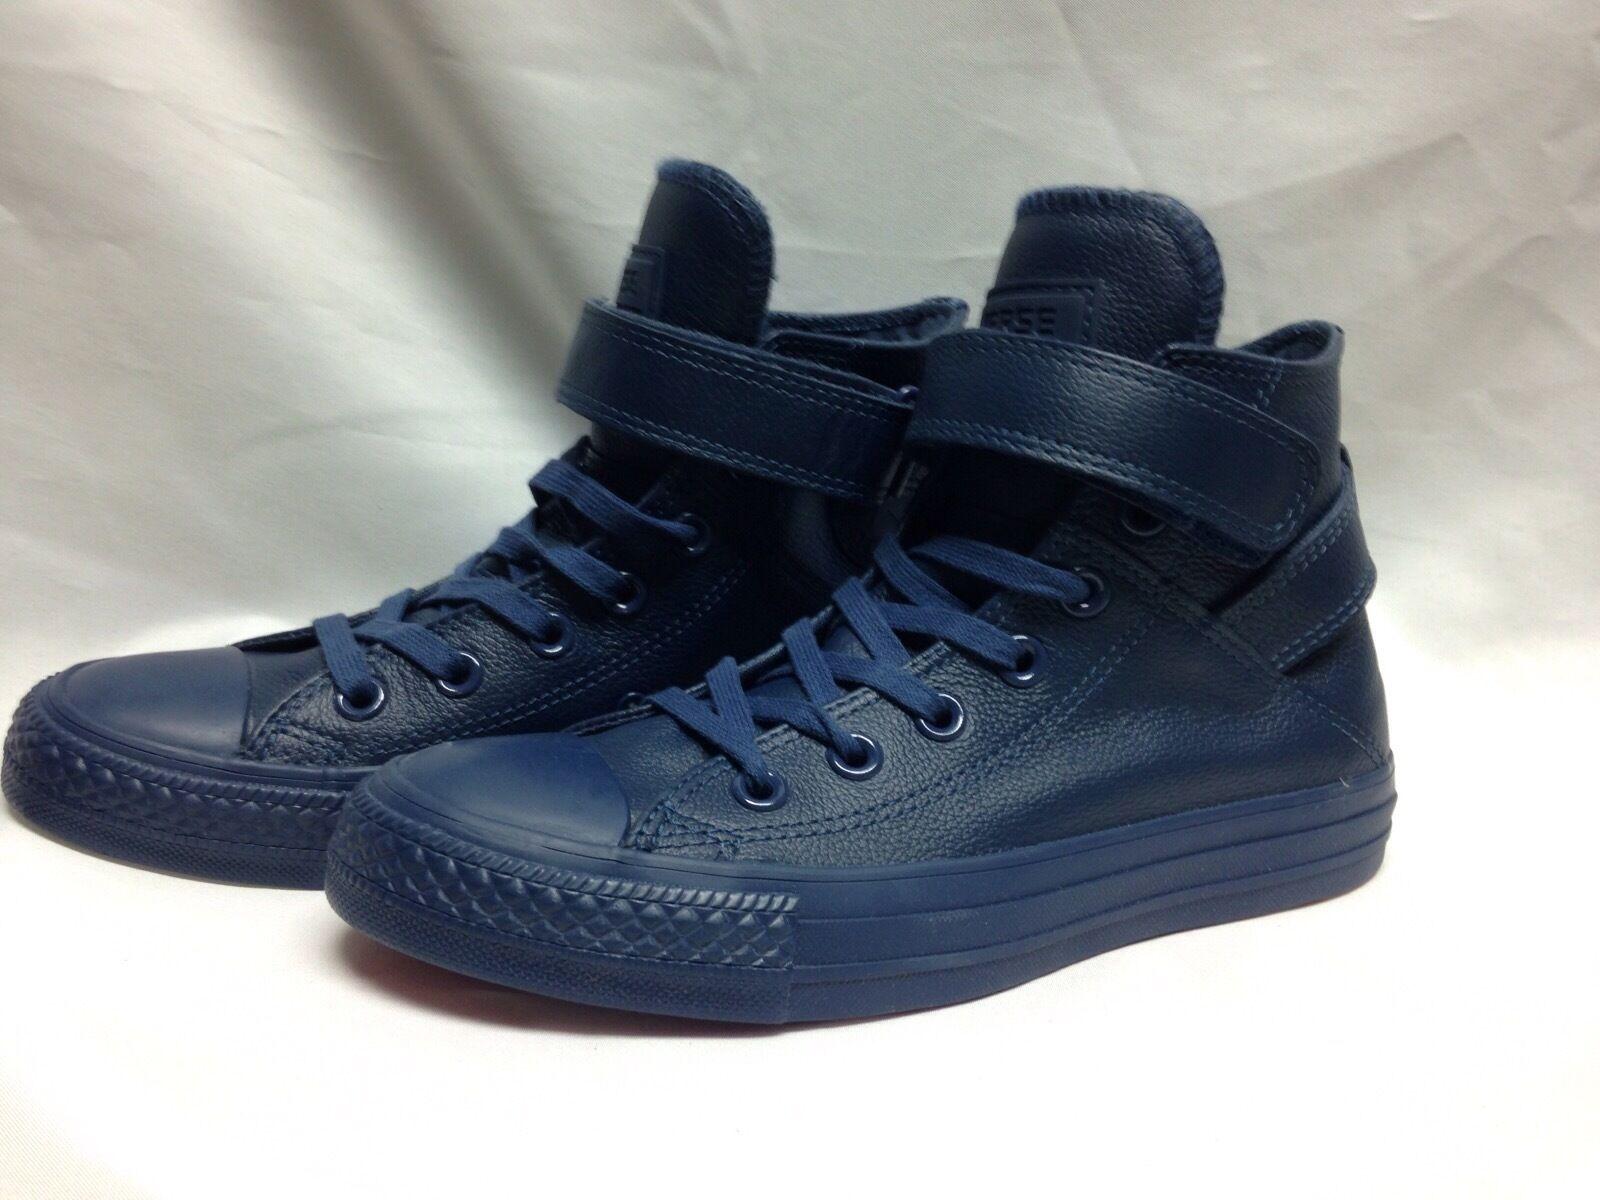 Converse Converse Converse CTAS BREA Hi Top Lace Up Sneaker 551583C Navy  New w  Box ae790a